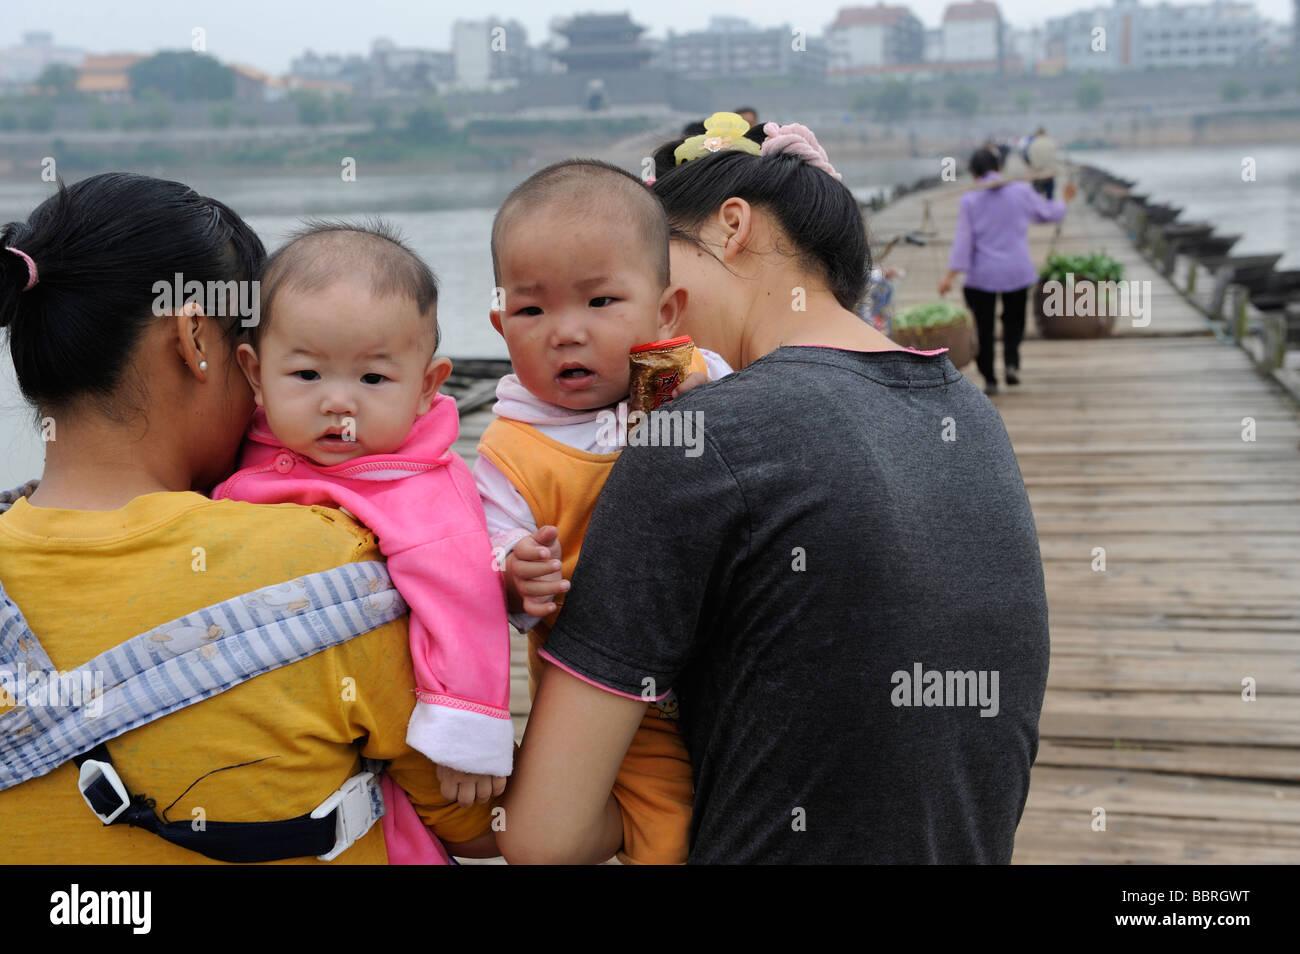 Chinese mothers hold babies in Ganzhou, Jiangxi, China. 11-Jun-2009 - Stock Image